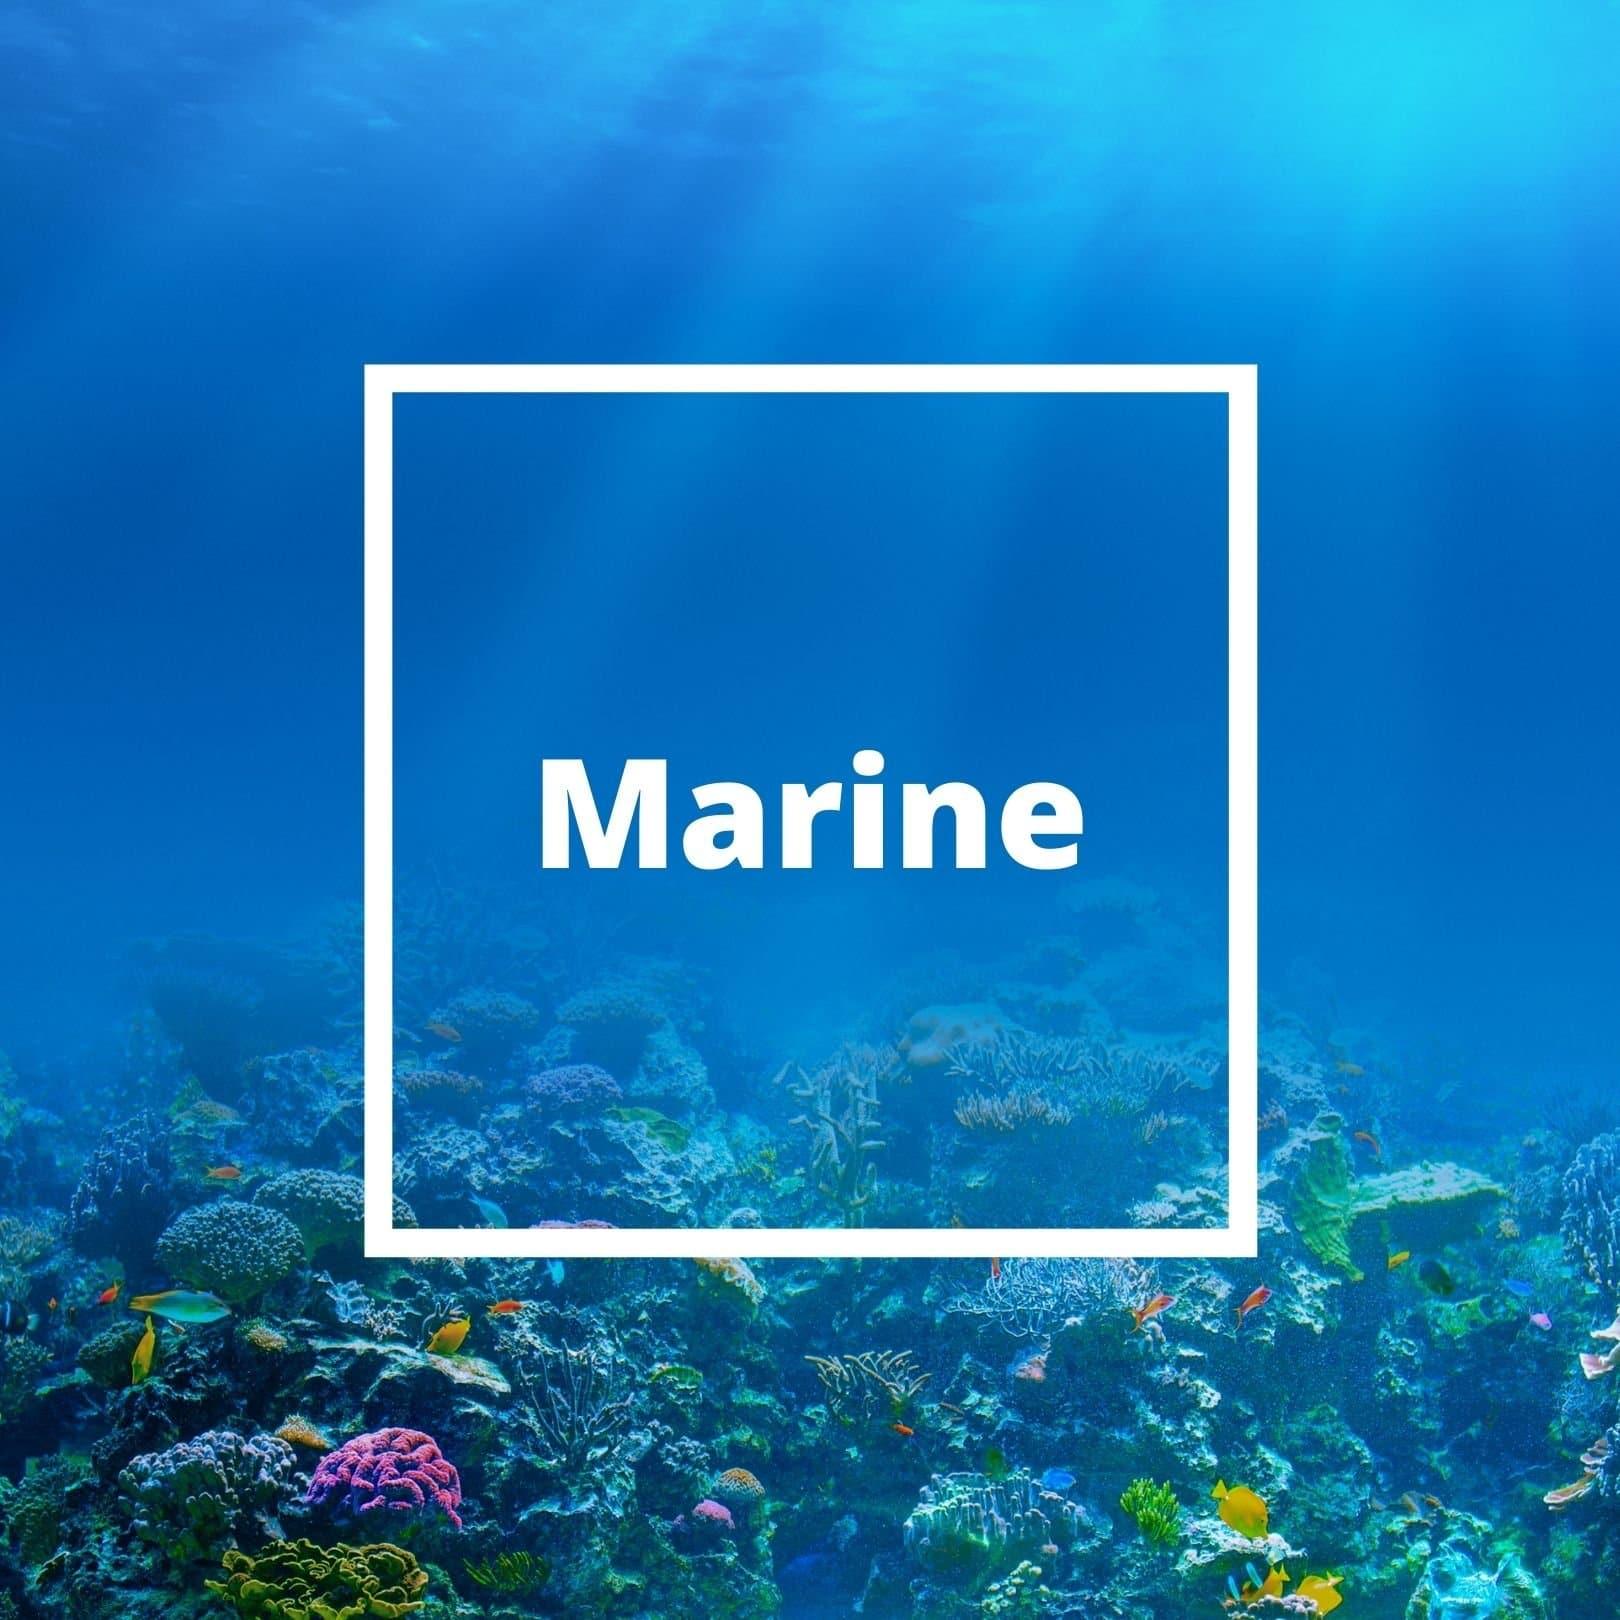 L'ATELIERO - Marine Notes - The One